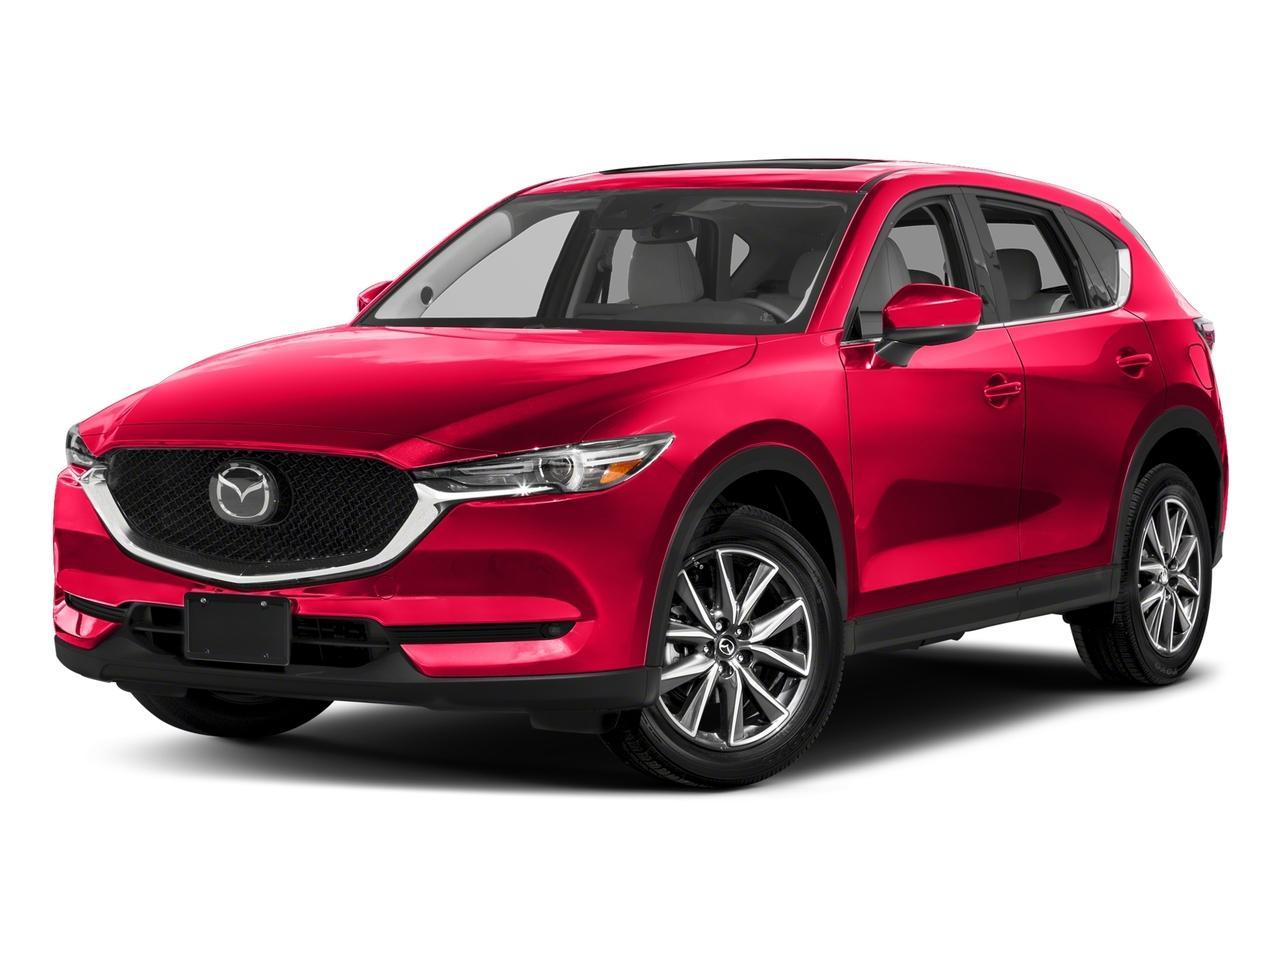 2017 Mazda CX-5 Vehicle Photo in Rockville, MD 20852